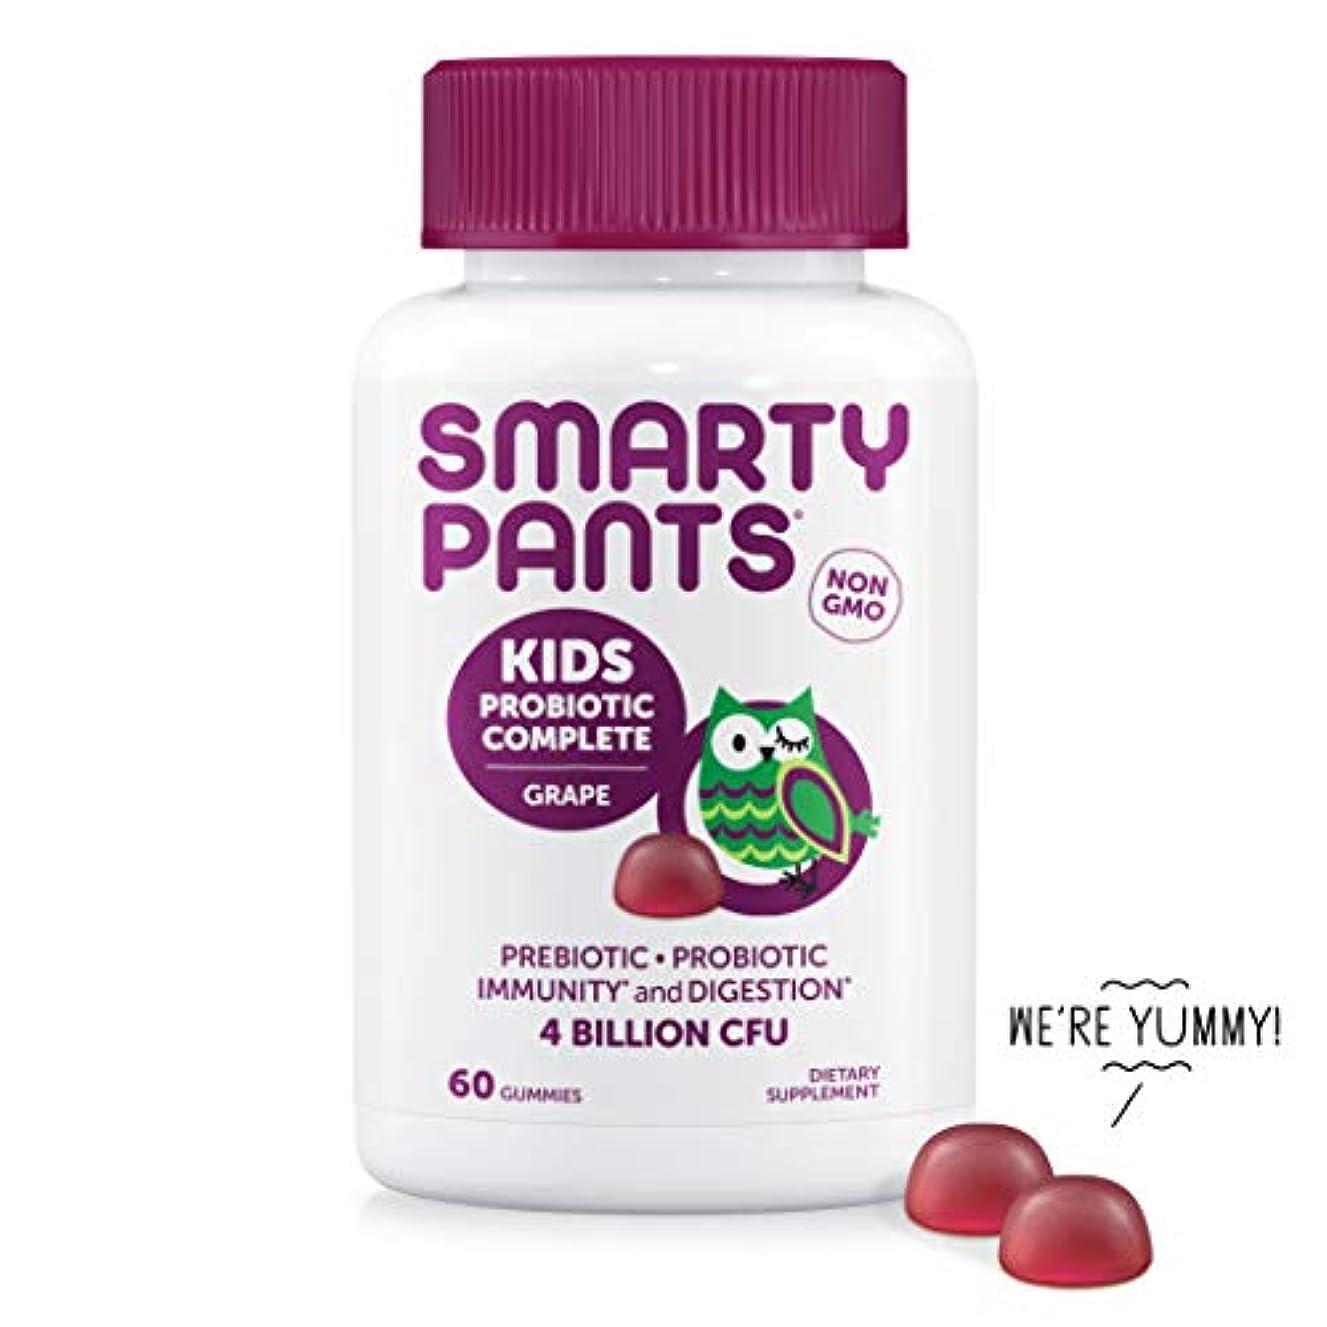 SmartyPants Kids Probiotic Complete; Probiotics & Prebiotics; Digestive & Immune Support* Gummies; 4 billion CFU, VEGAN, NON-GMO, NO REFRIGERATION REQUIRED, Grape Flavor, 30 Day Supply, 60 Count